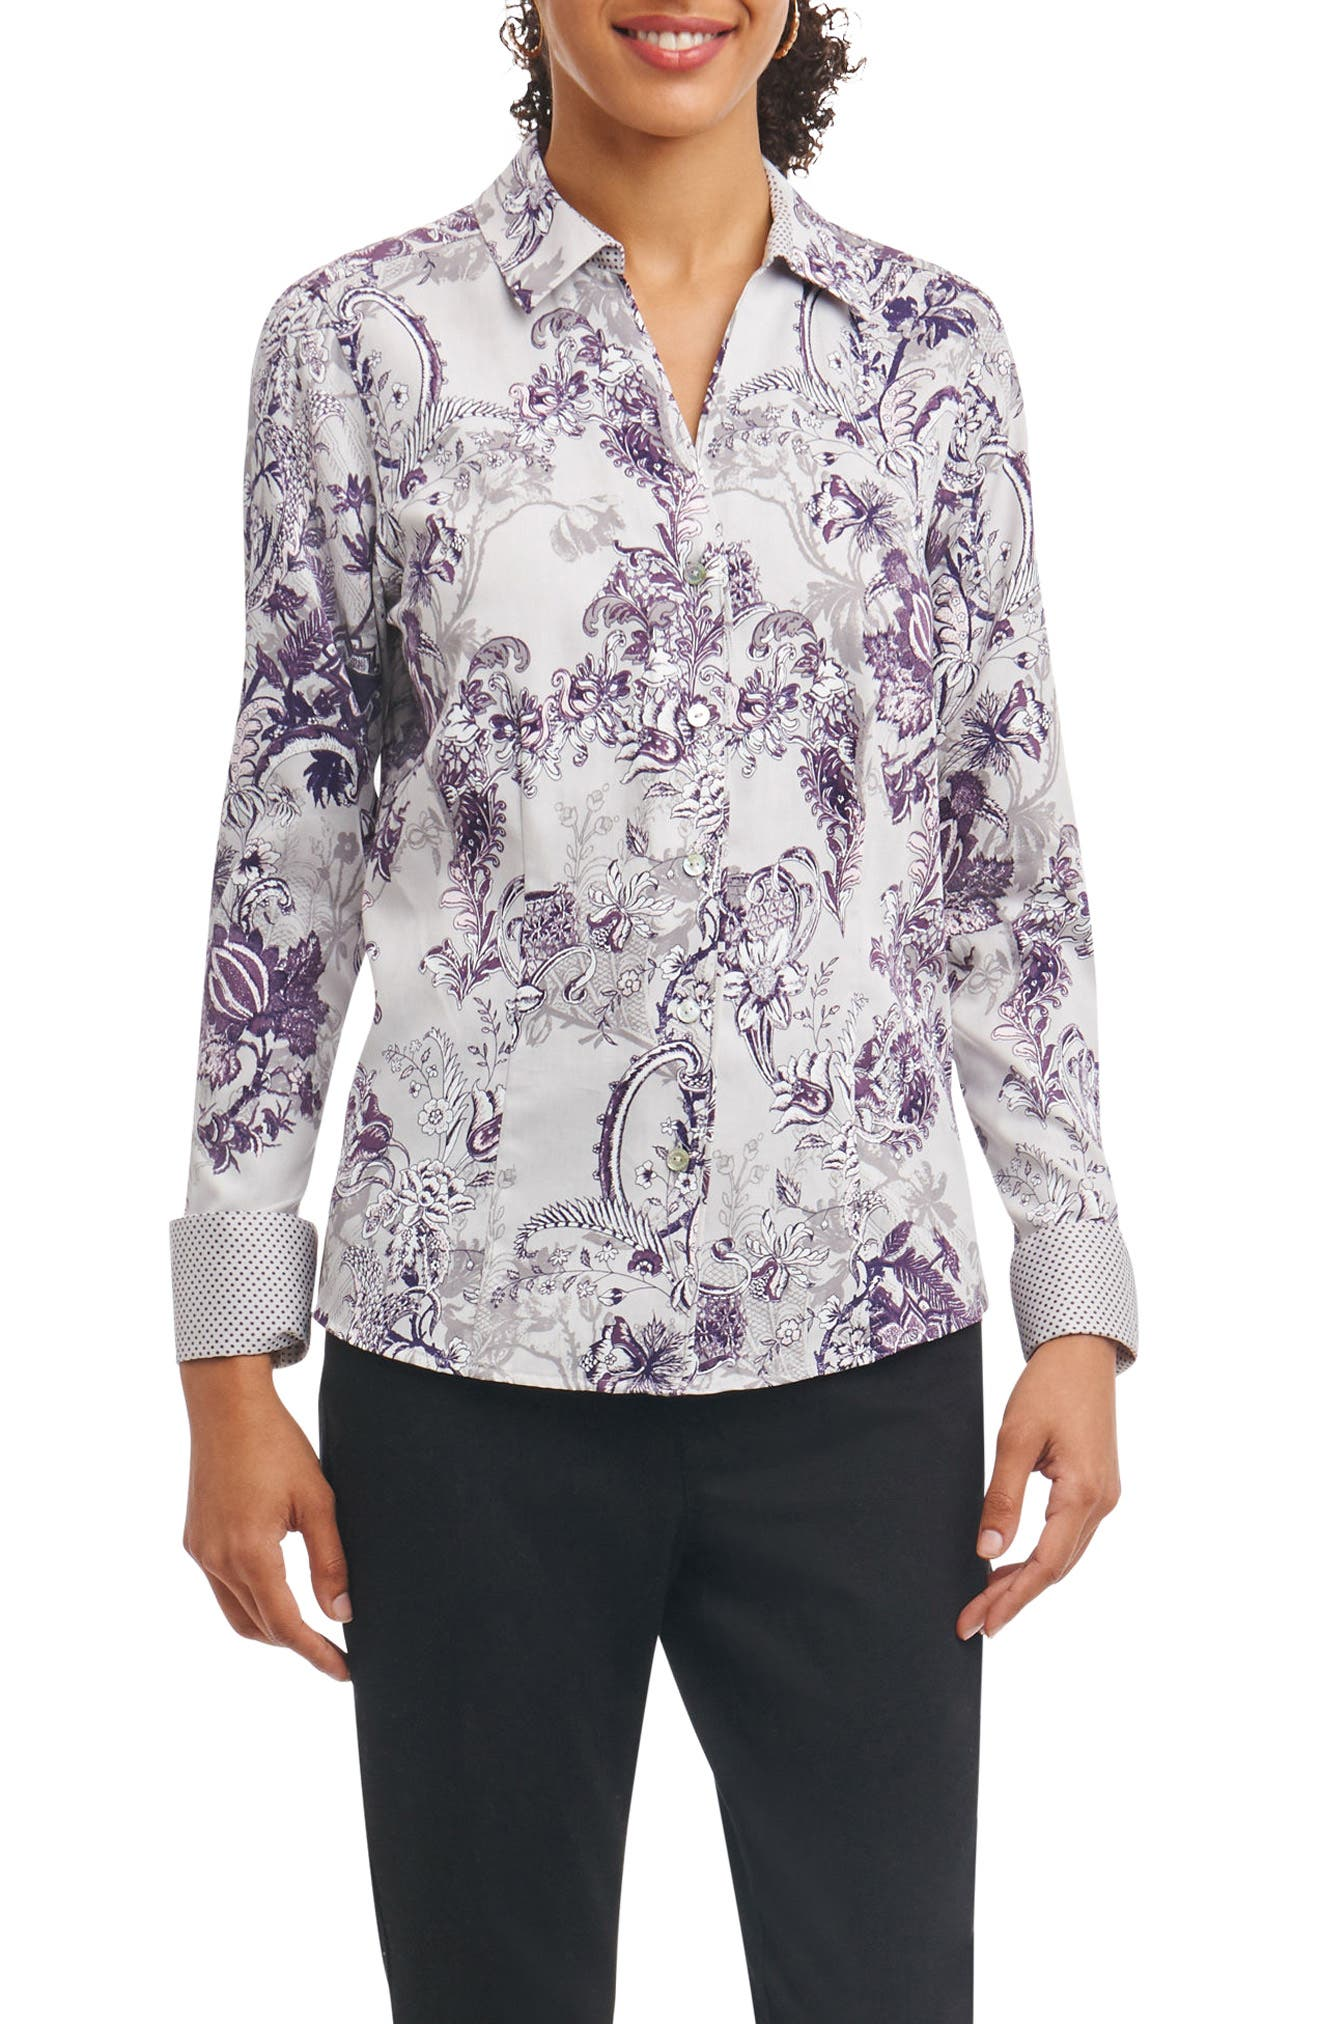 Main Image - Foxcroft Lauren Floral Tapestry Wrinkle Free Shirt (Regular & Petite)